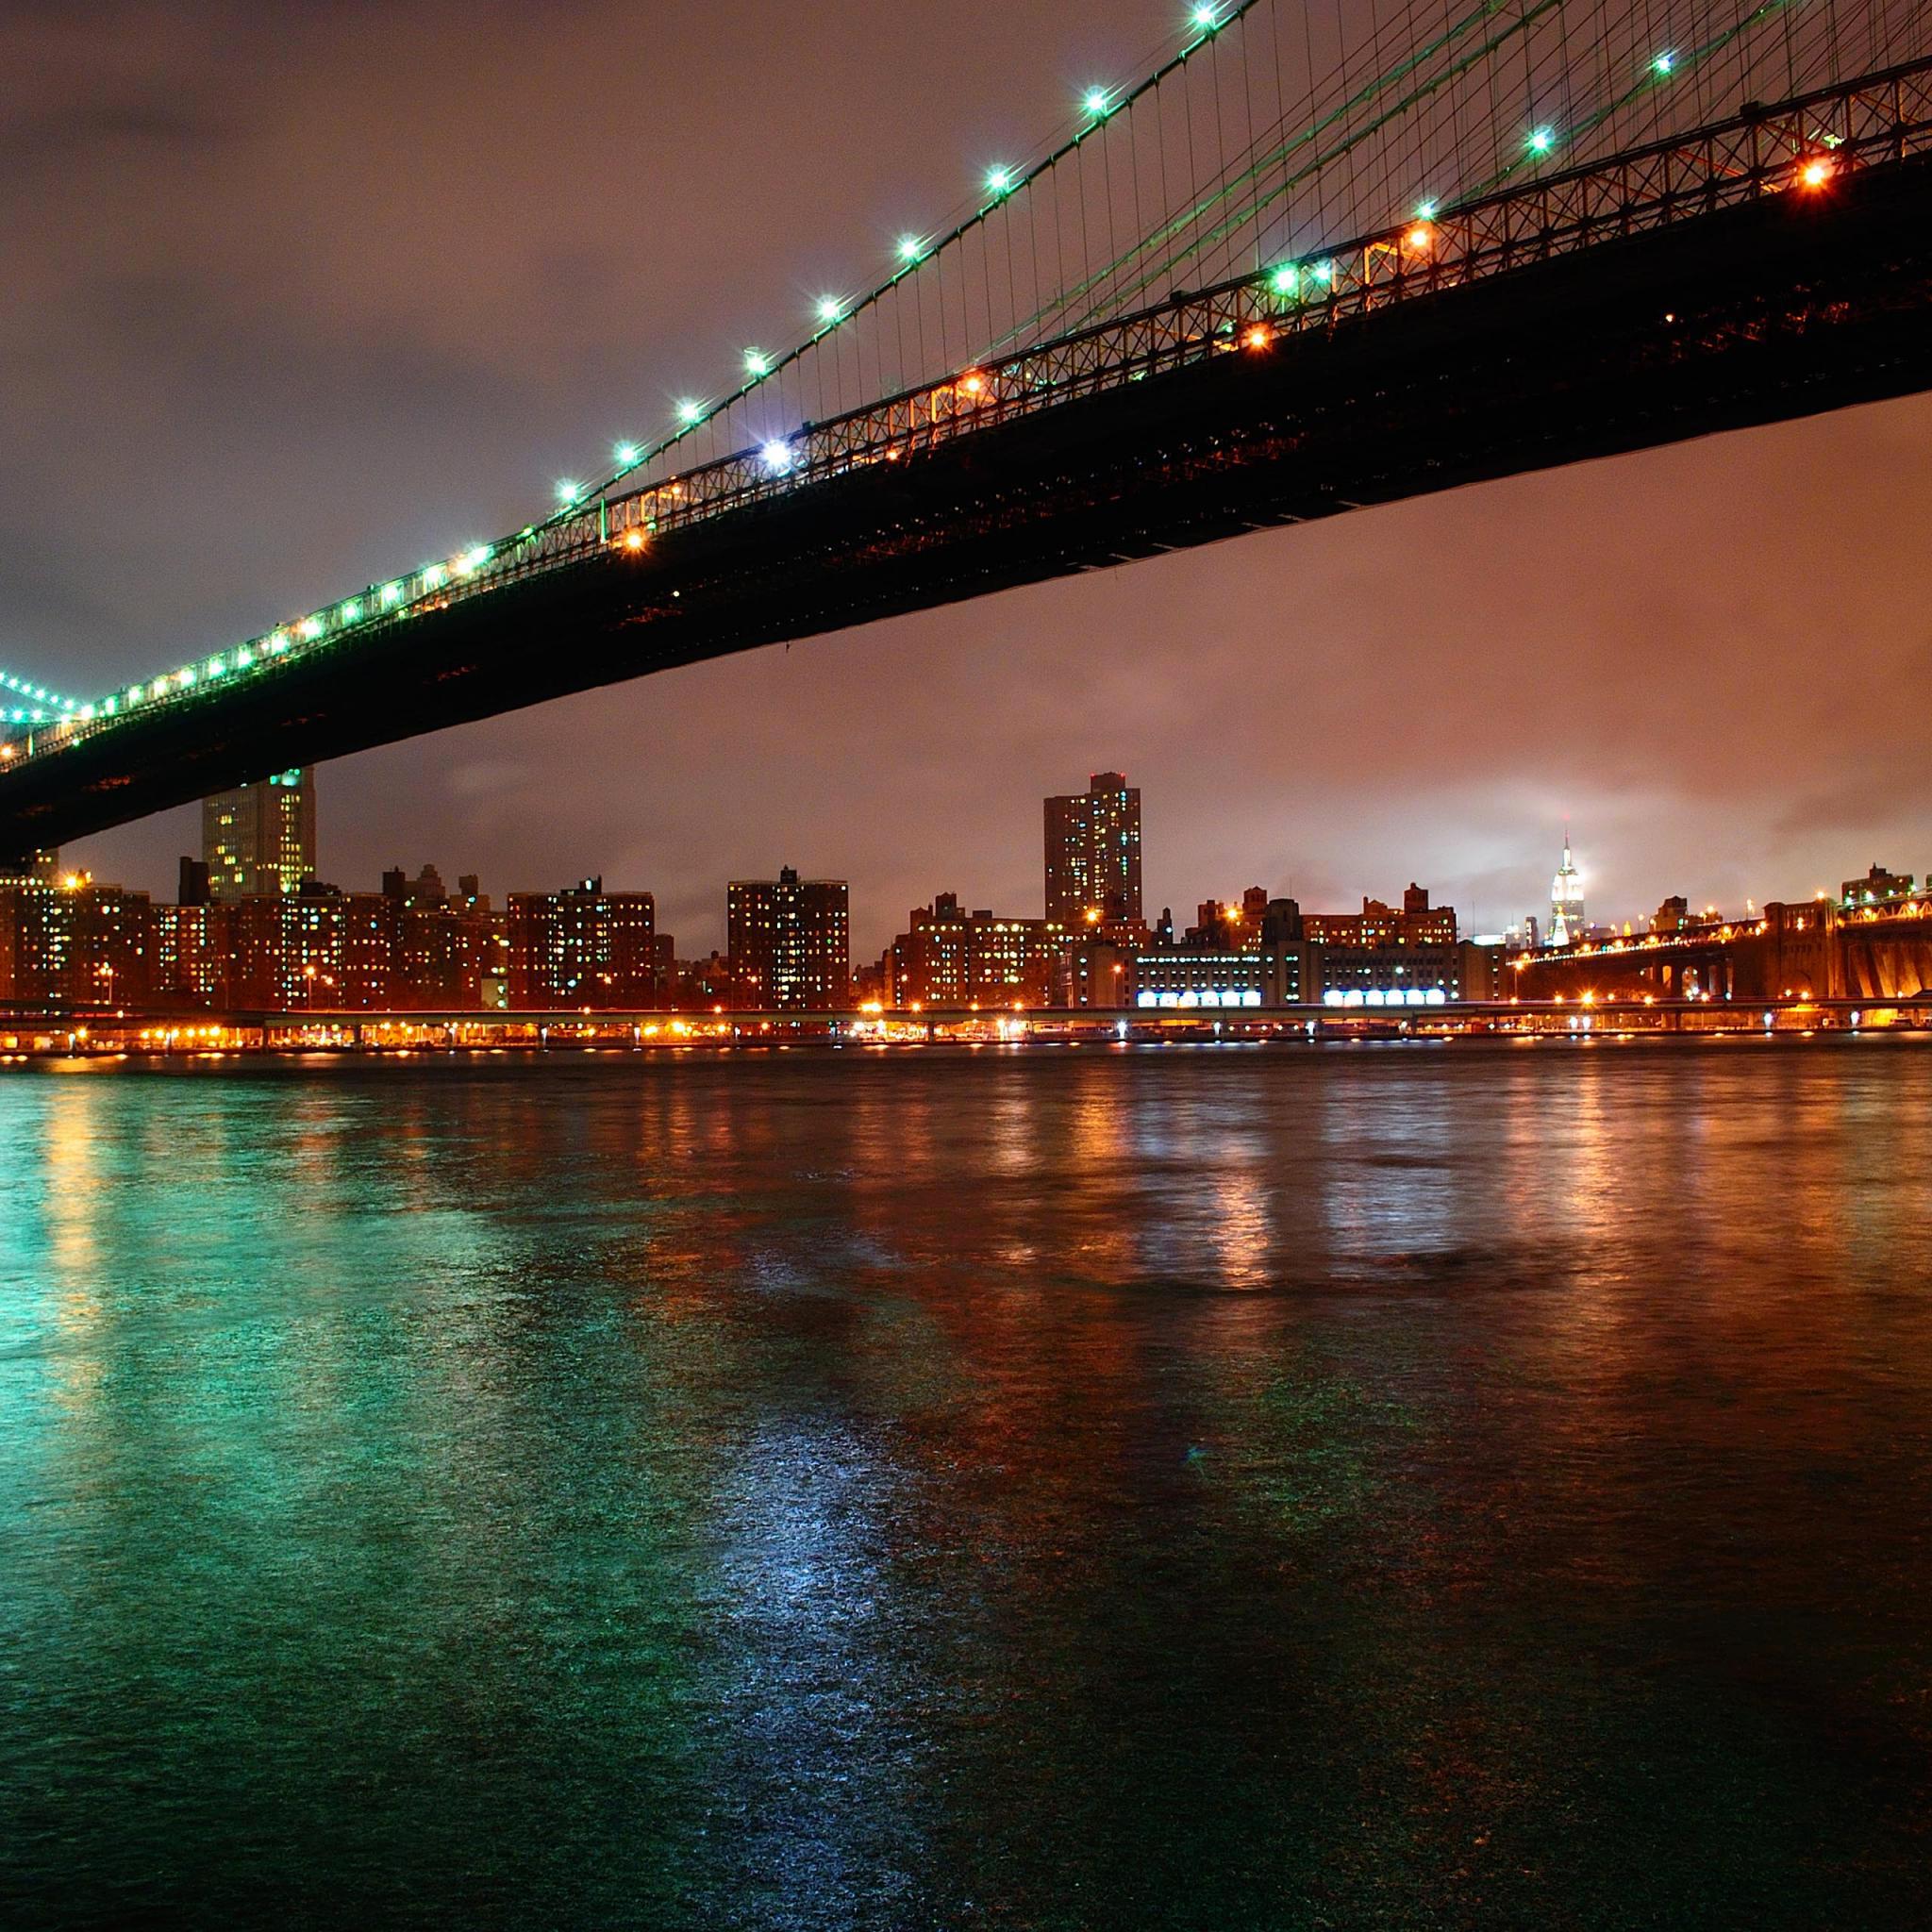 Brooklyn-Bridge-3Wallpapers-iPad-Retina